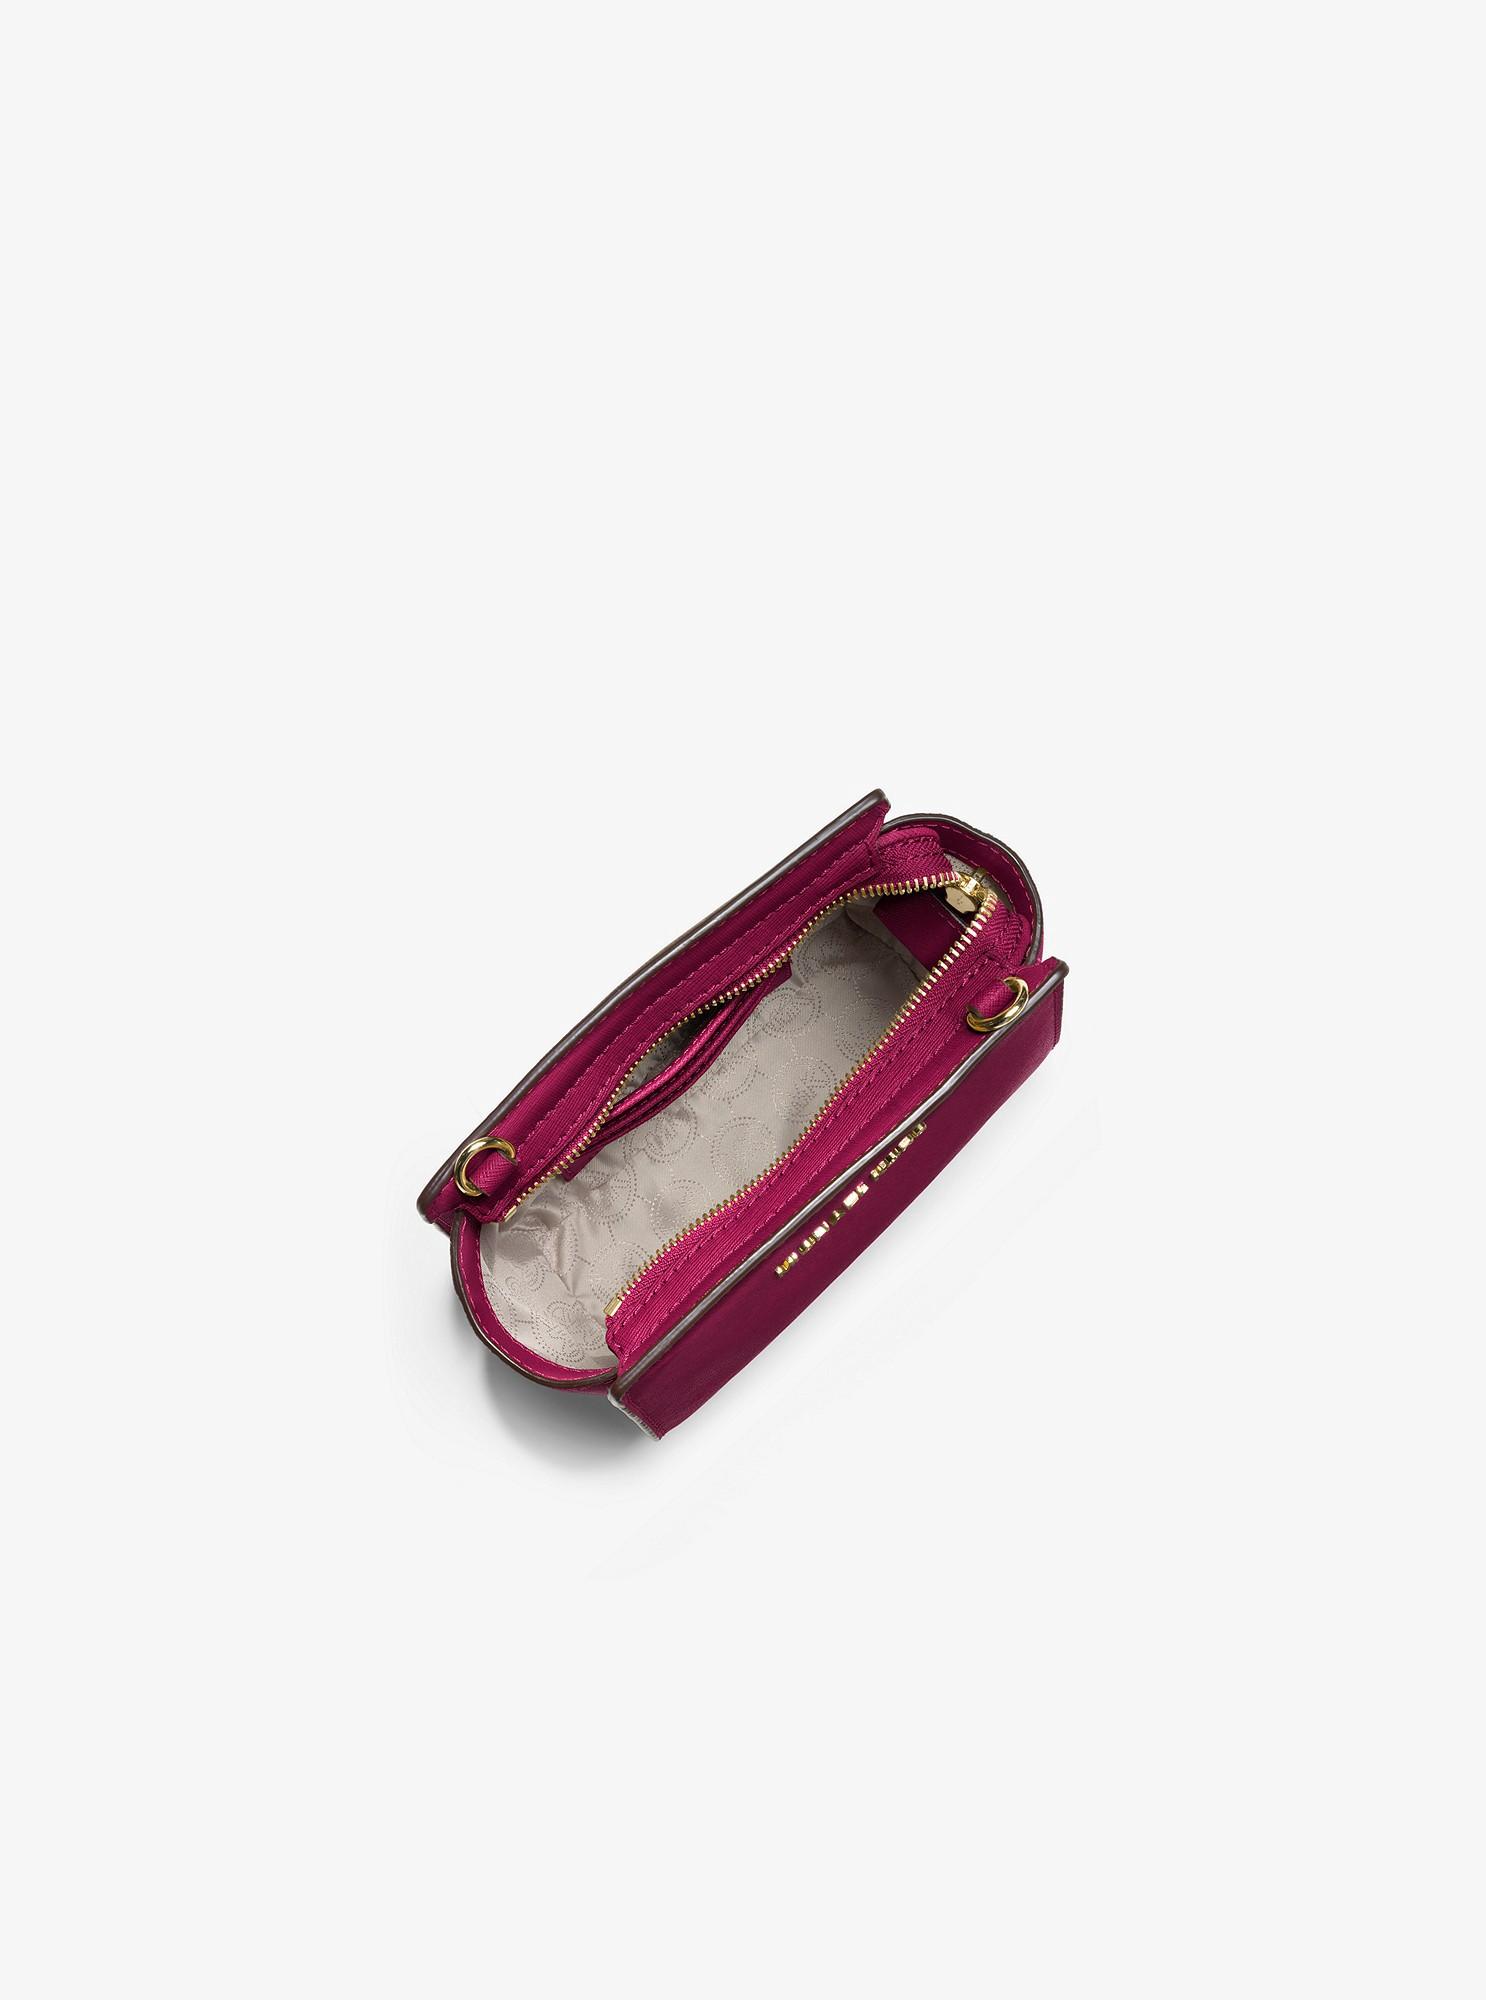 c16be9dcd386 Michael Kors Selma Mini Saffiano Leather Crossbody - Soft Pink ...